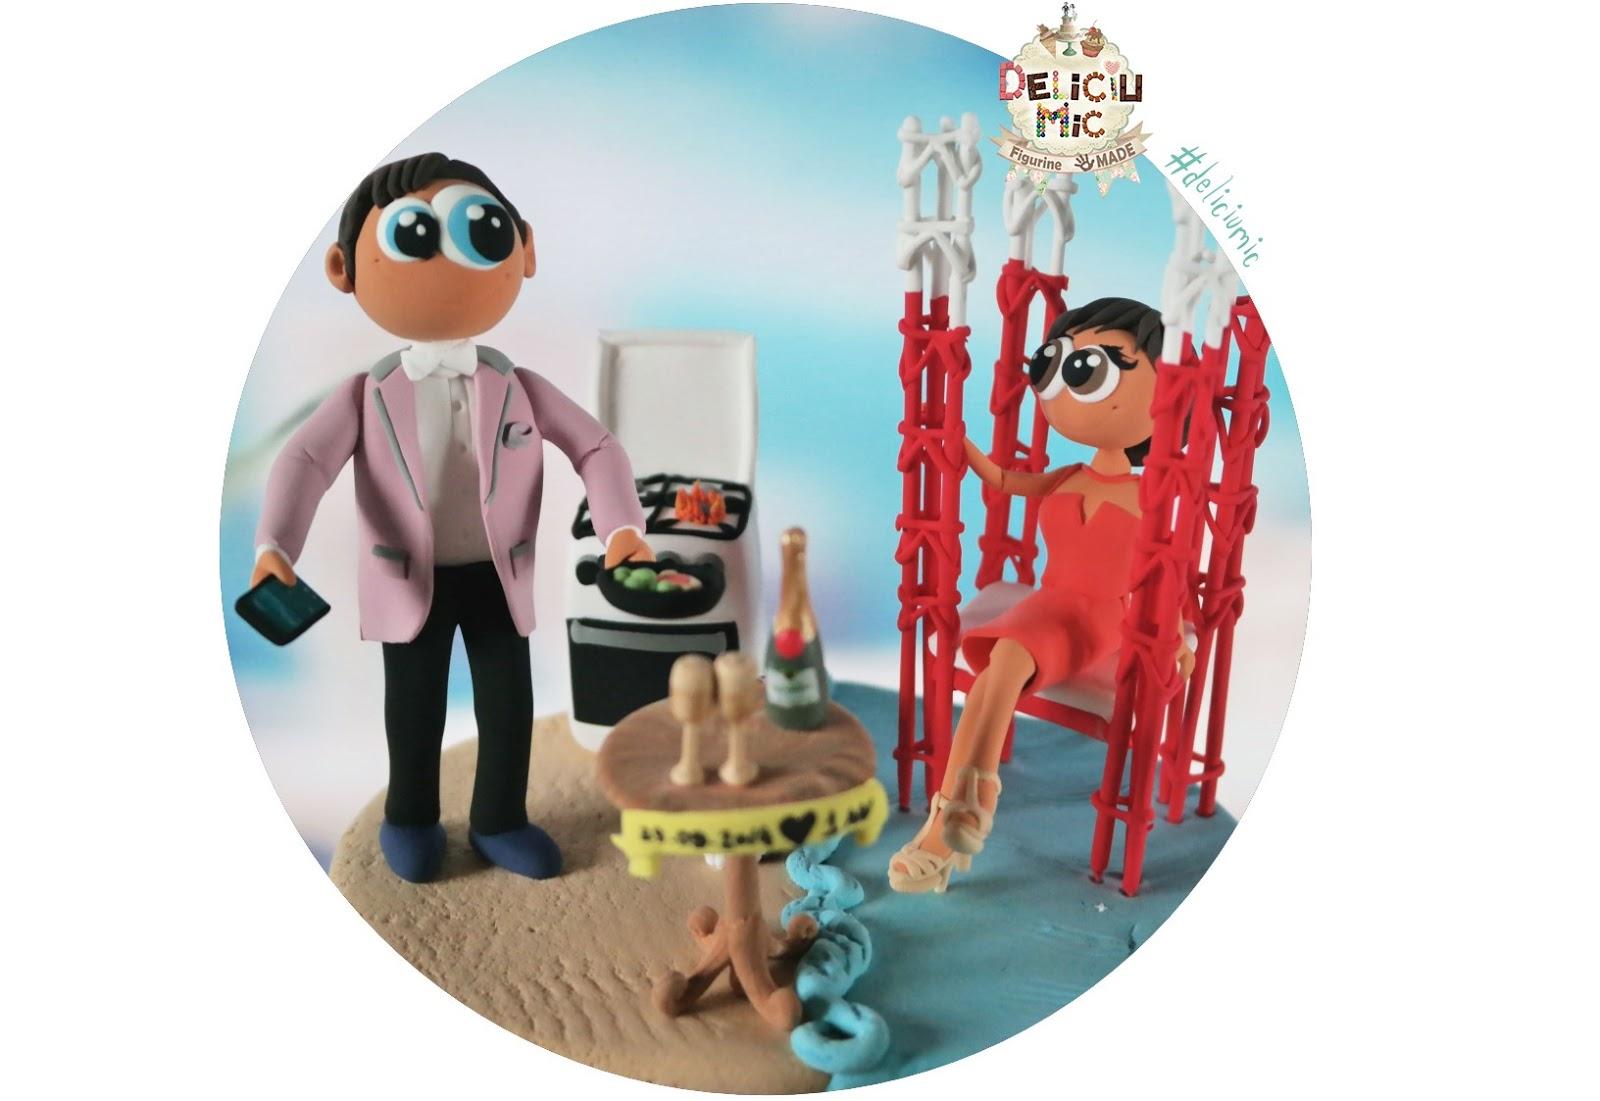 Figurine personalizate Valentine's day